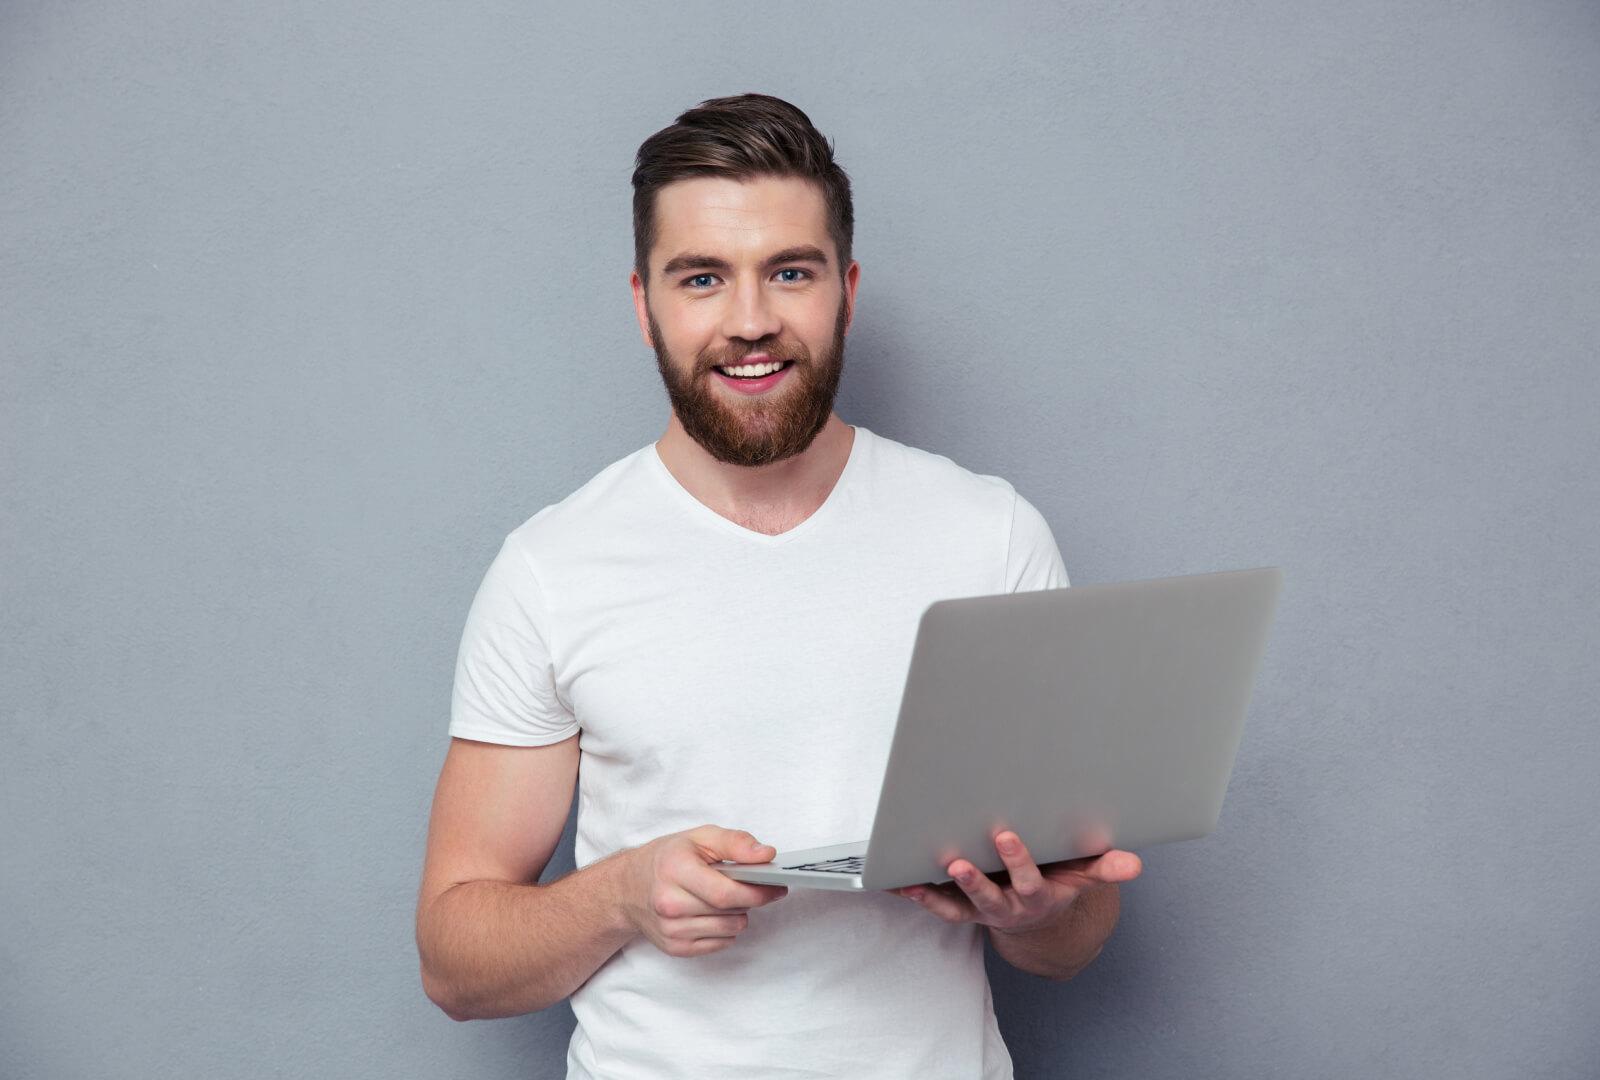 blog-people-with-mackbook